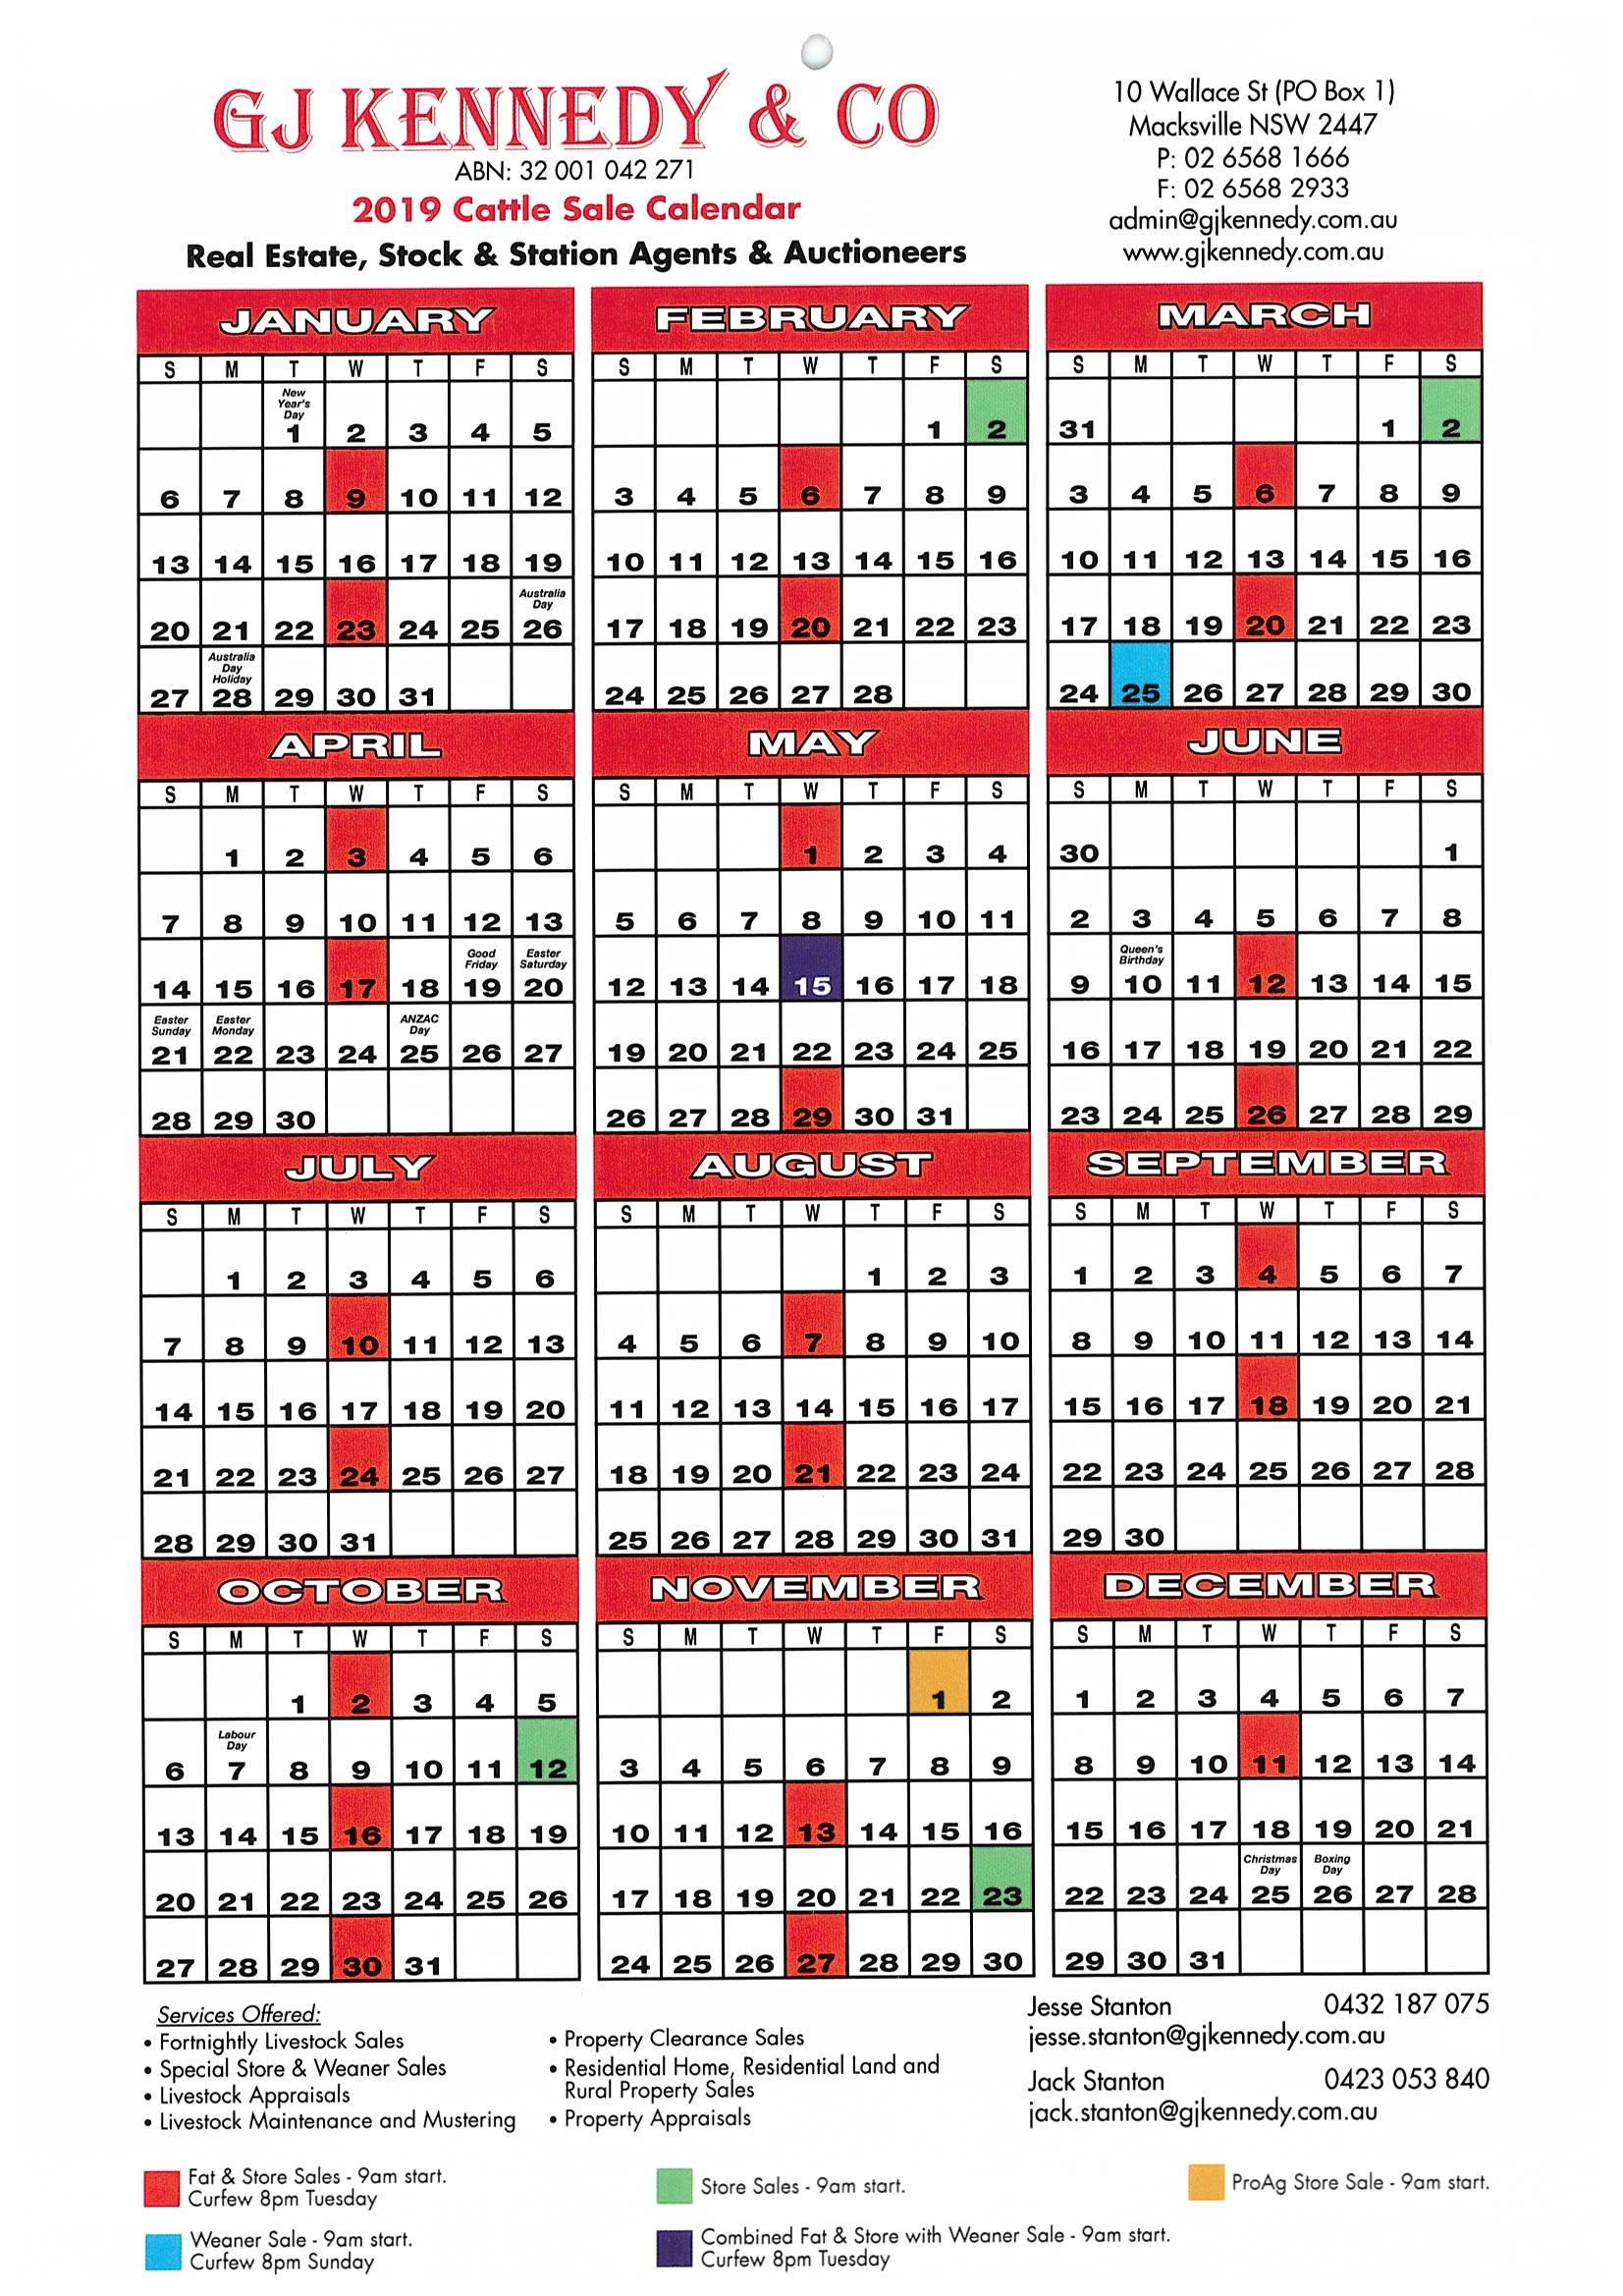 G J Kennedy & Co Pty Ltd - Livestock Sale Dates Calendar 2019 Sale